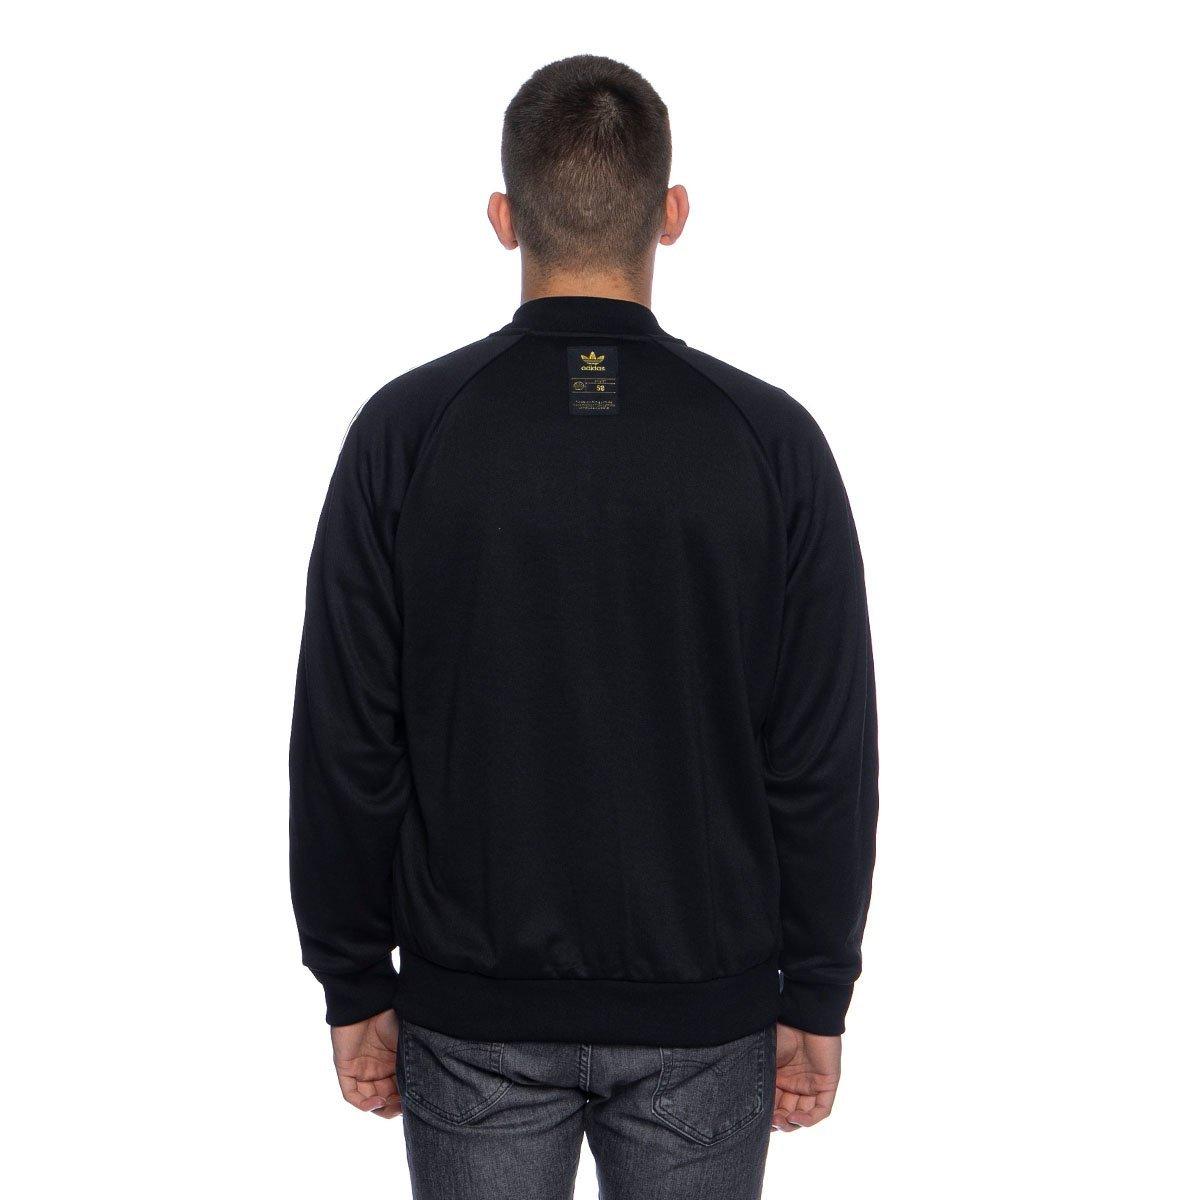 Adidas Originals Sweatshirt SST 24 TT blackgold metallic